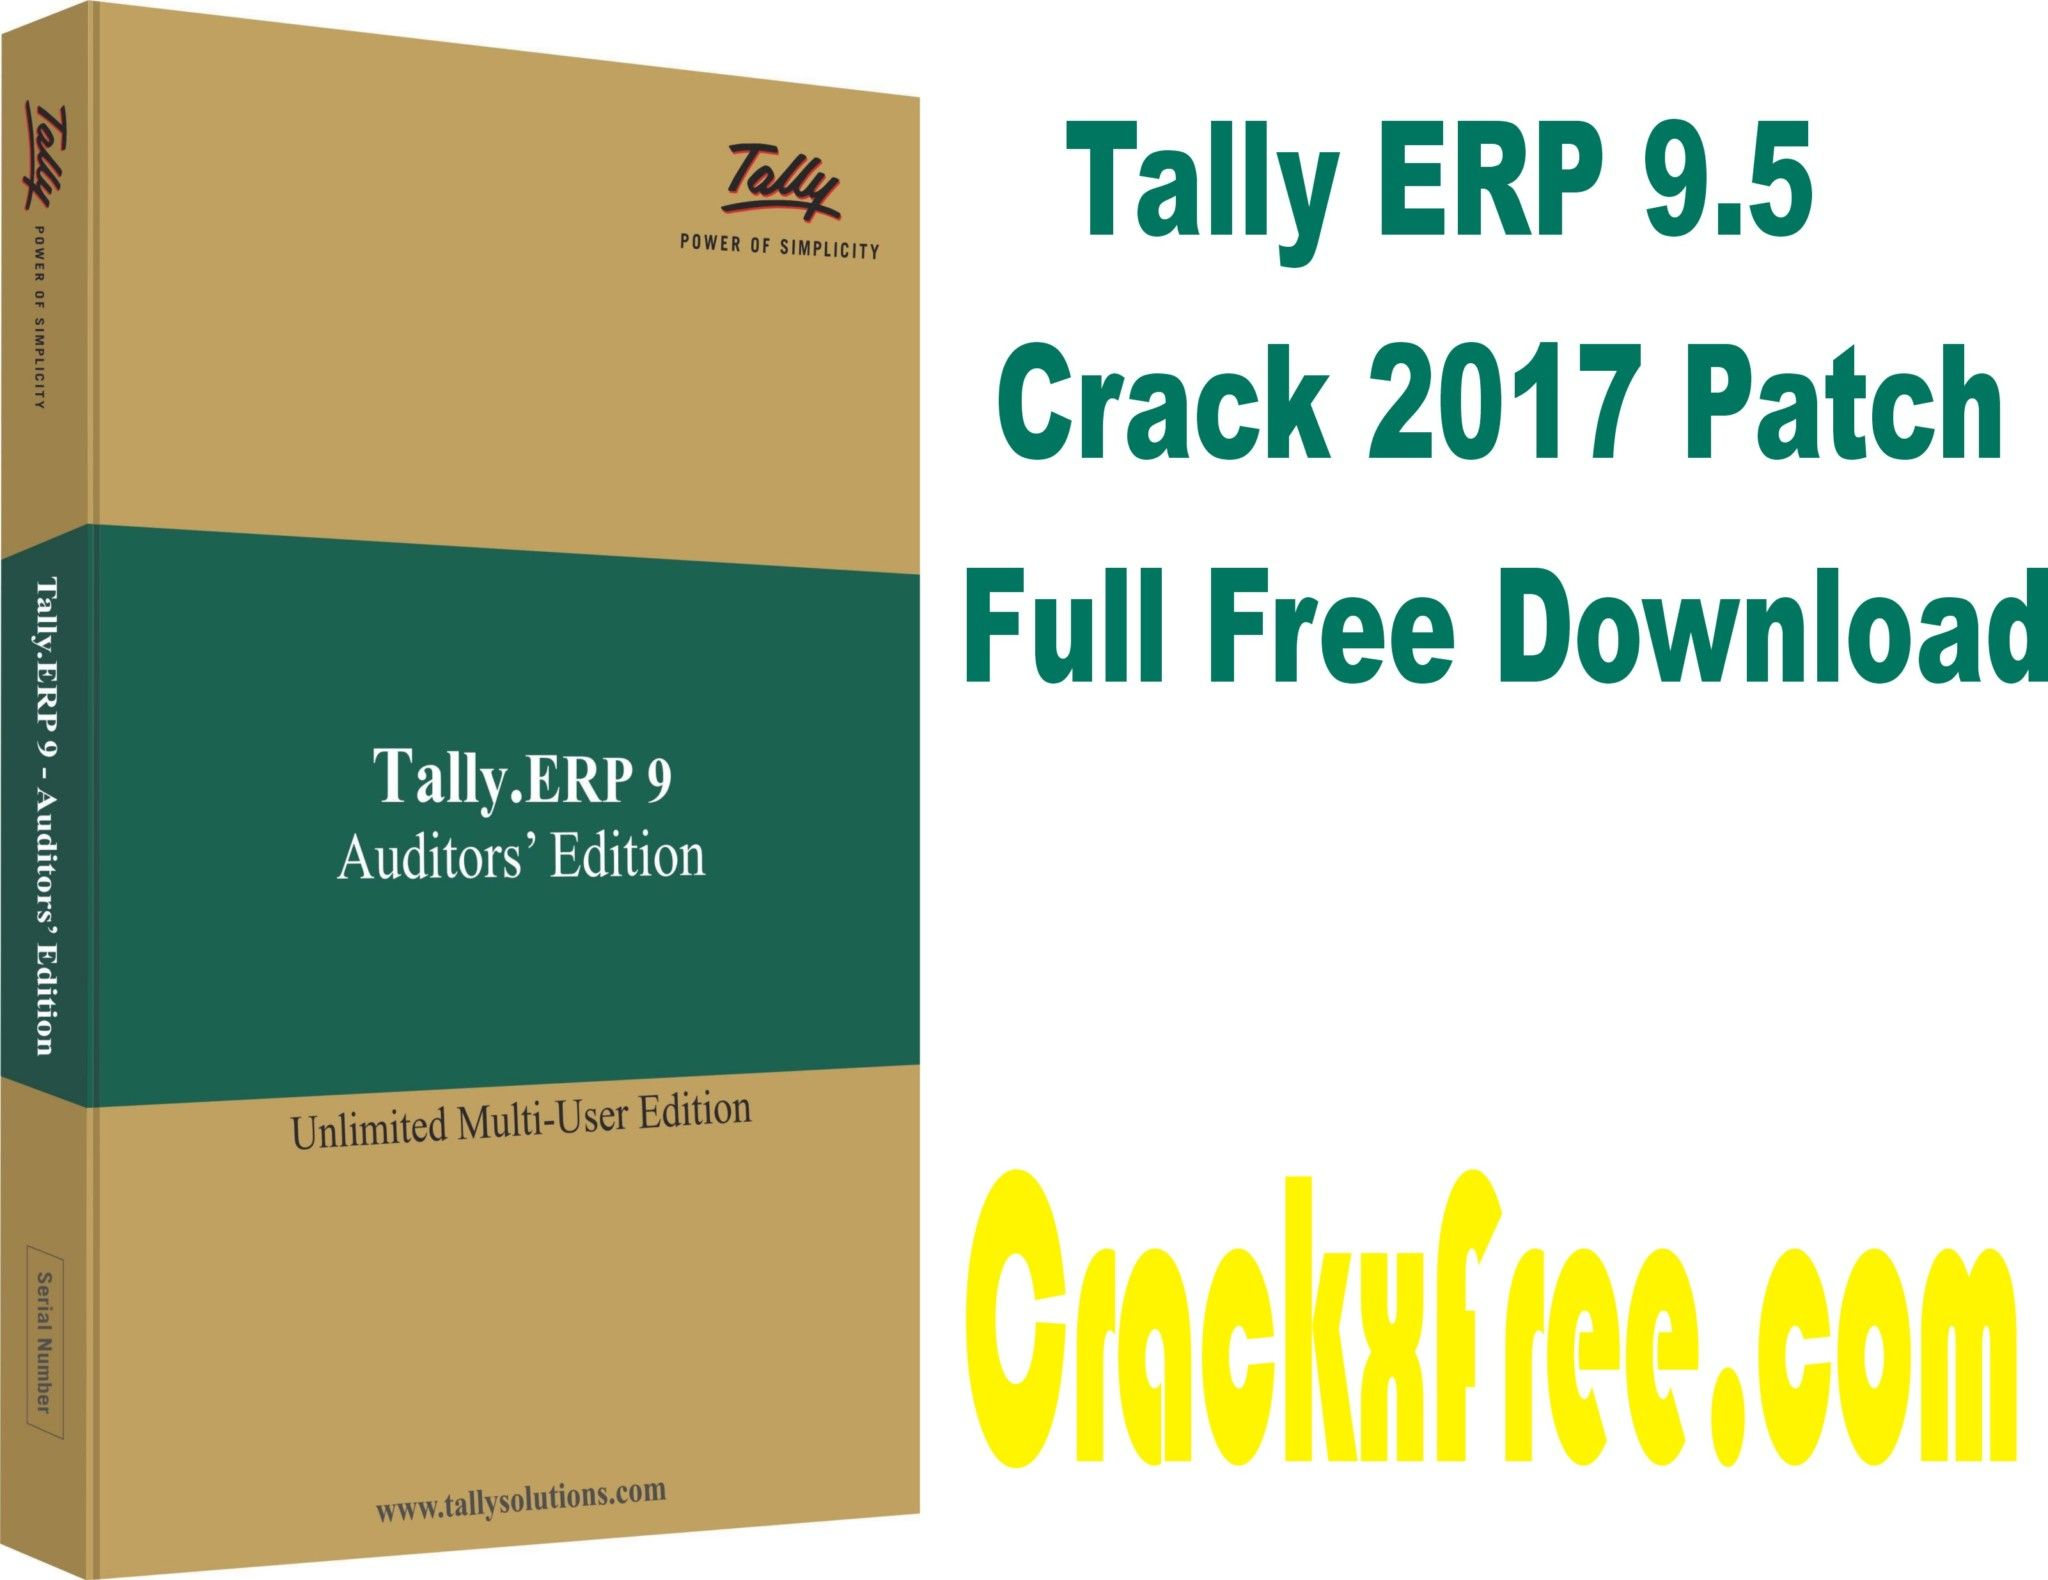 tally erp 9 crack version free download utorrent